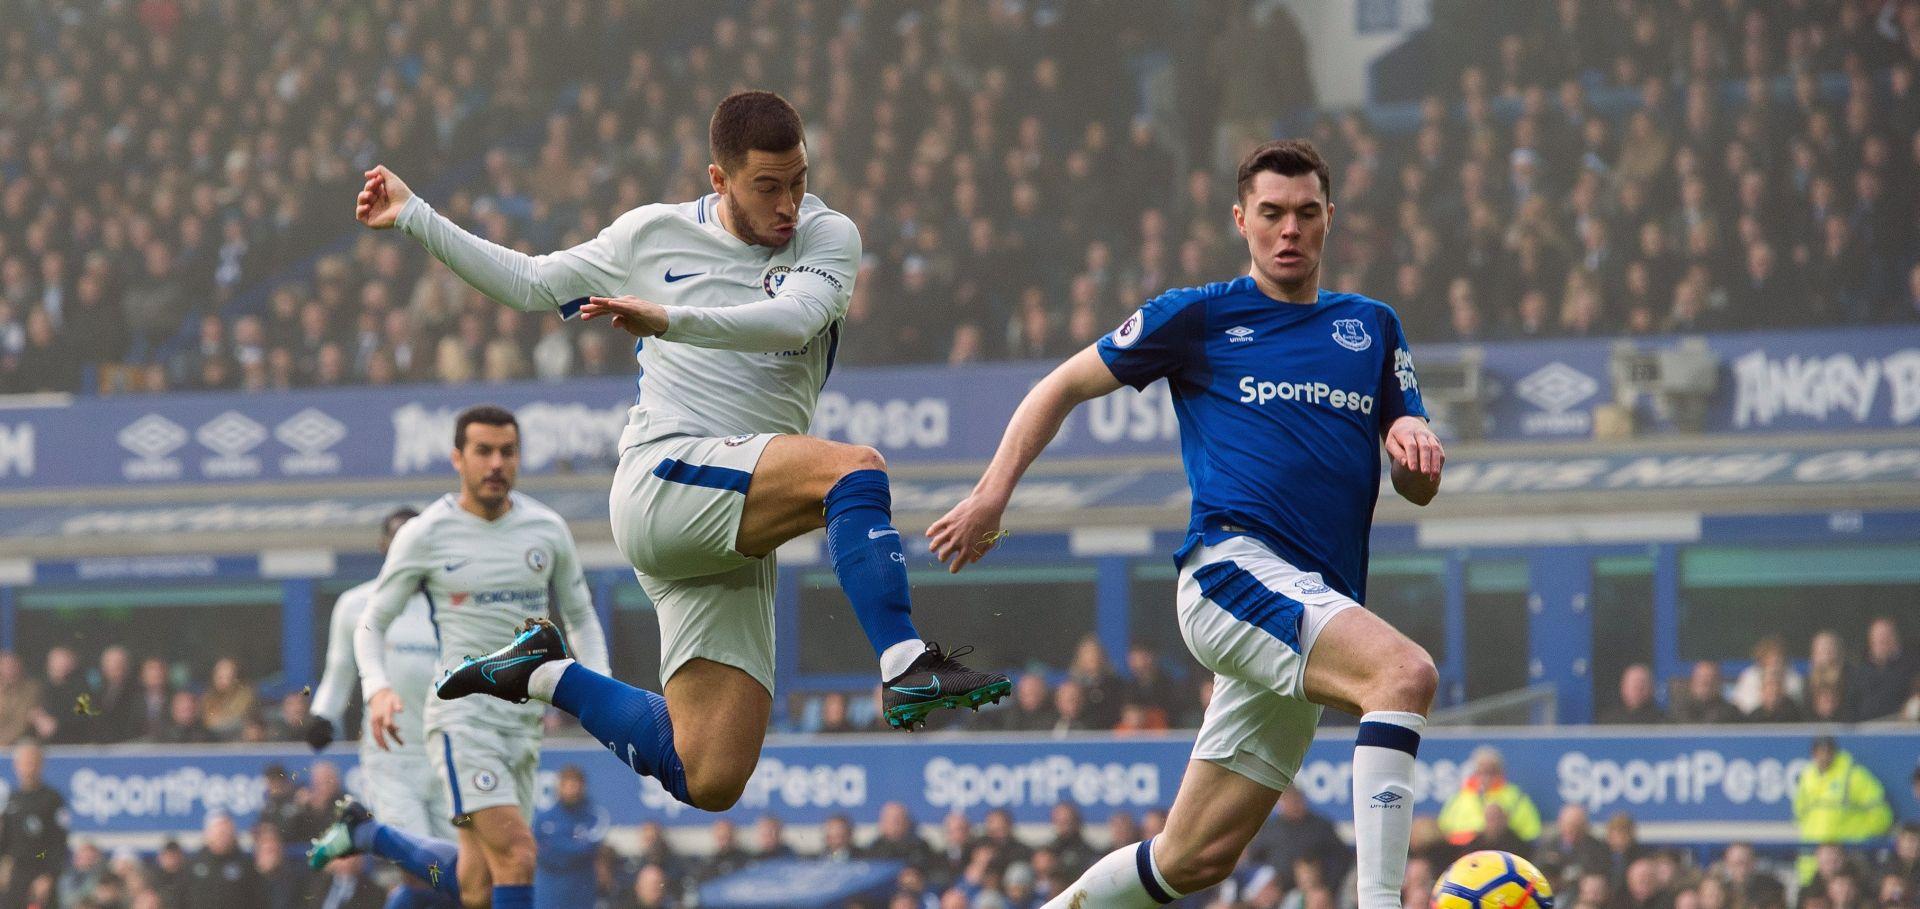 ŠESTA UTAKMICA BEZ PORAZA Everton i Chelsea odigrali bez golova